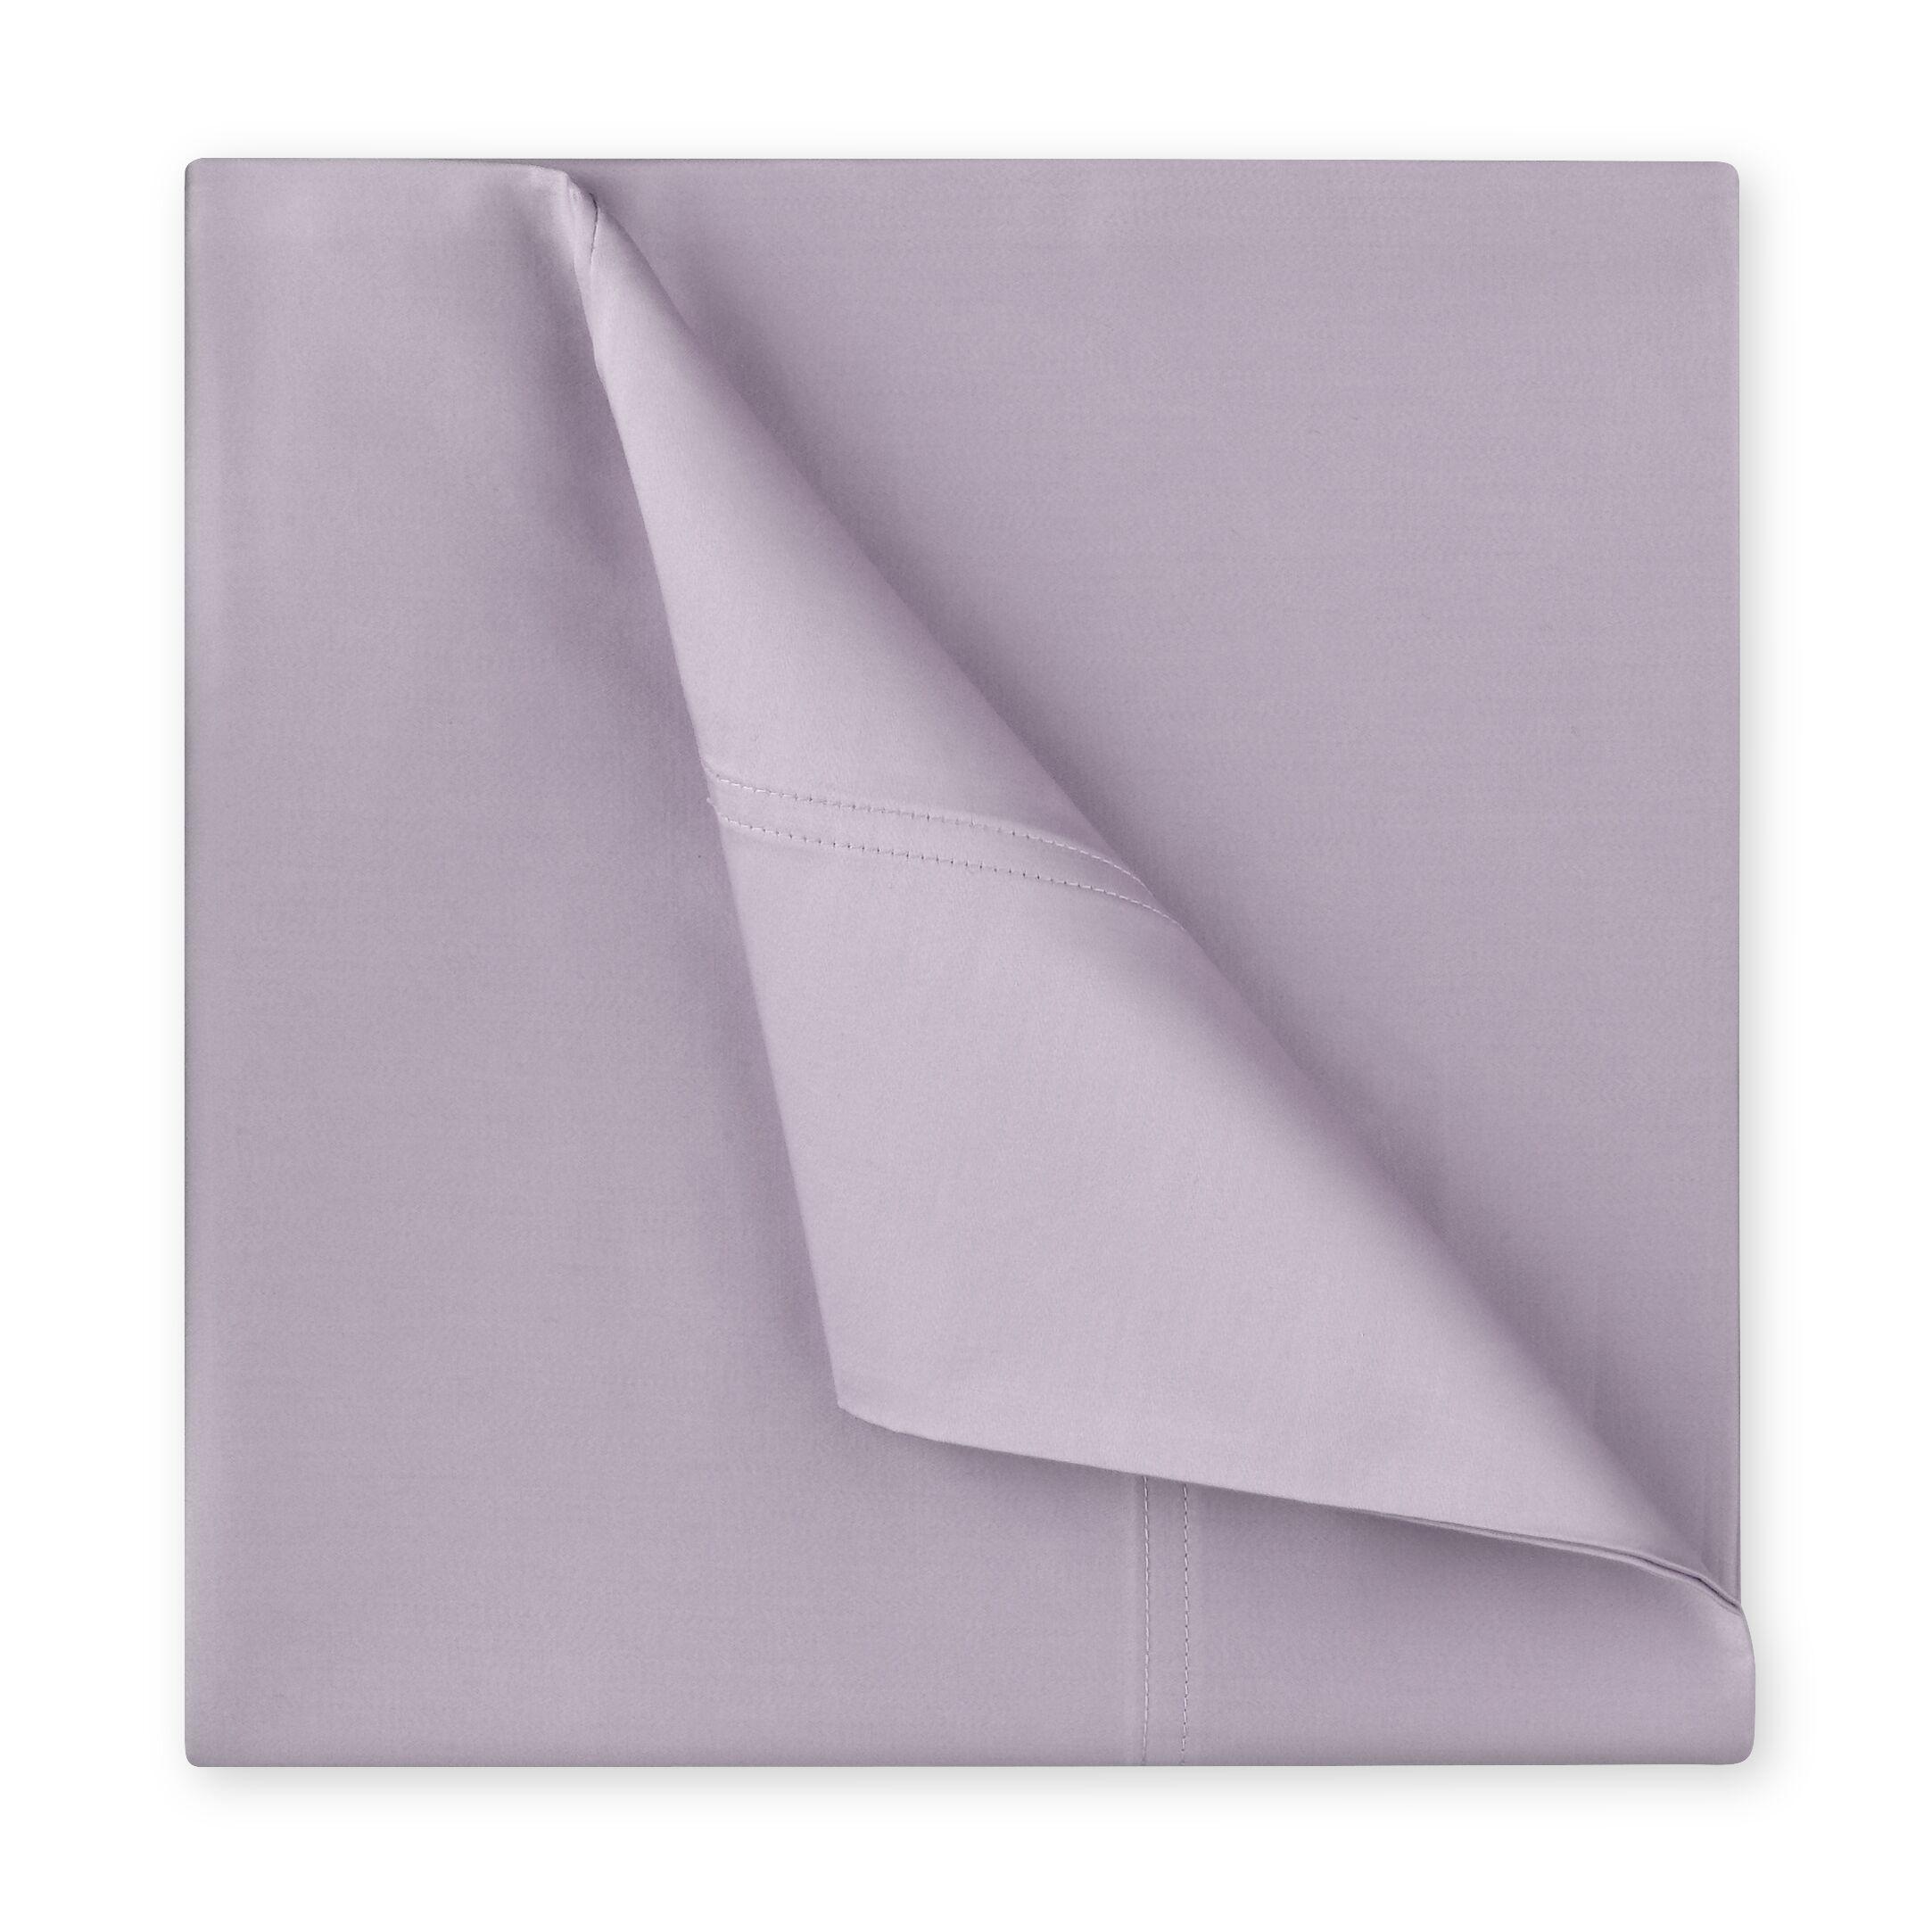 Williamsburg 400 Thread Count Cotton Sateen Sheet Set Color: Iris, Size: King